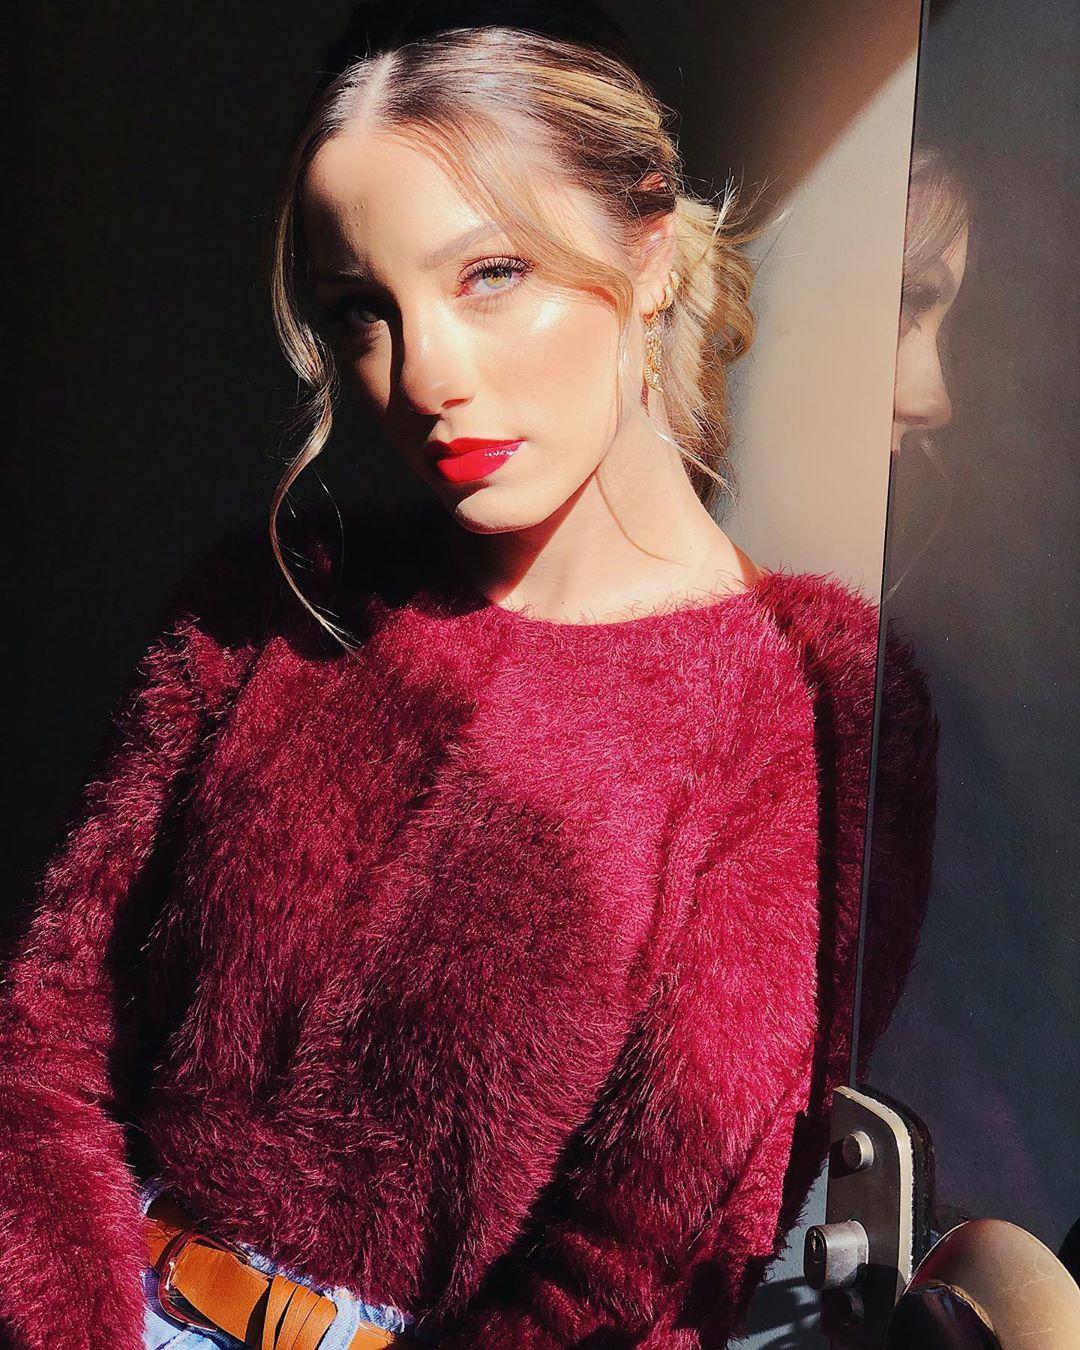 isabela stella, candidata a miss parana 2020, miss arapongas 2017/2019. 95366810